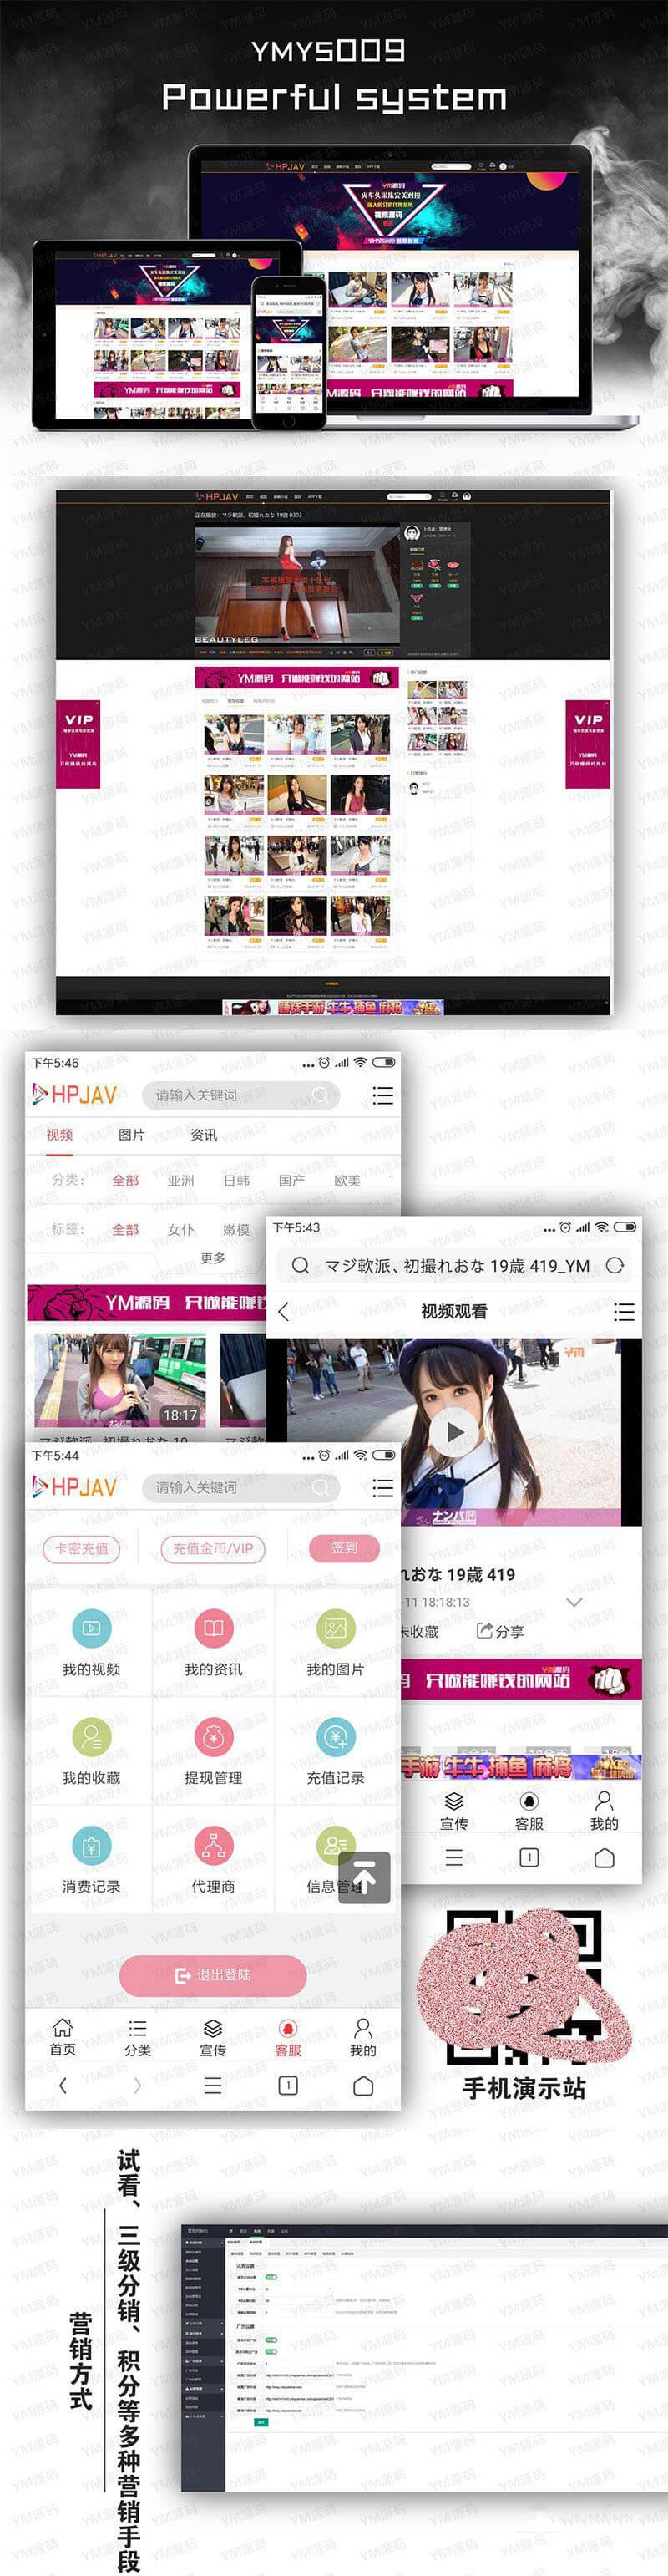 YMYS009强大专业的x站在线视频网站系统源码 (https://www.8uc8.com/) 源码下载 第1张